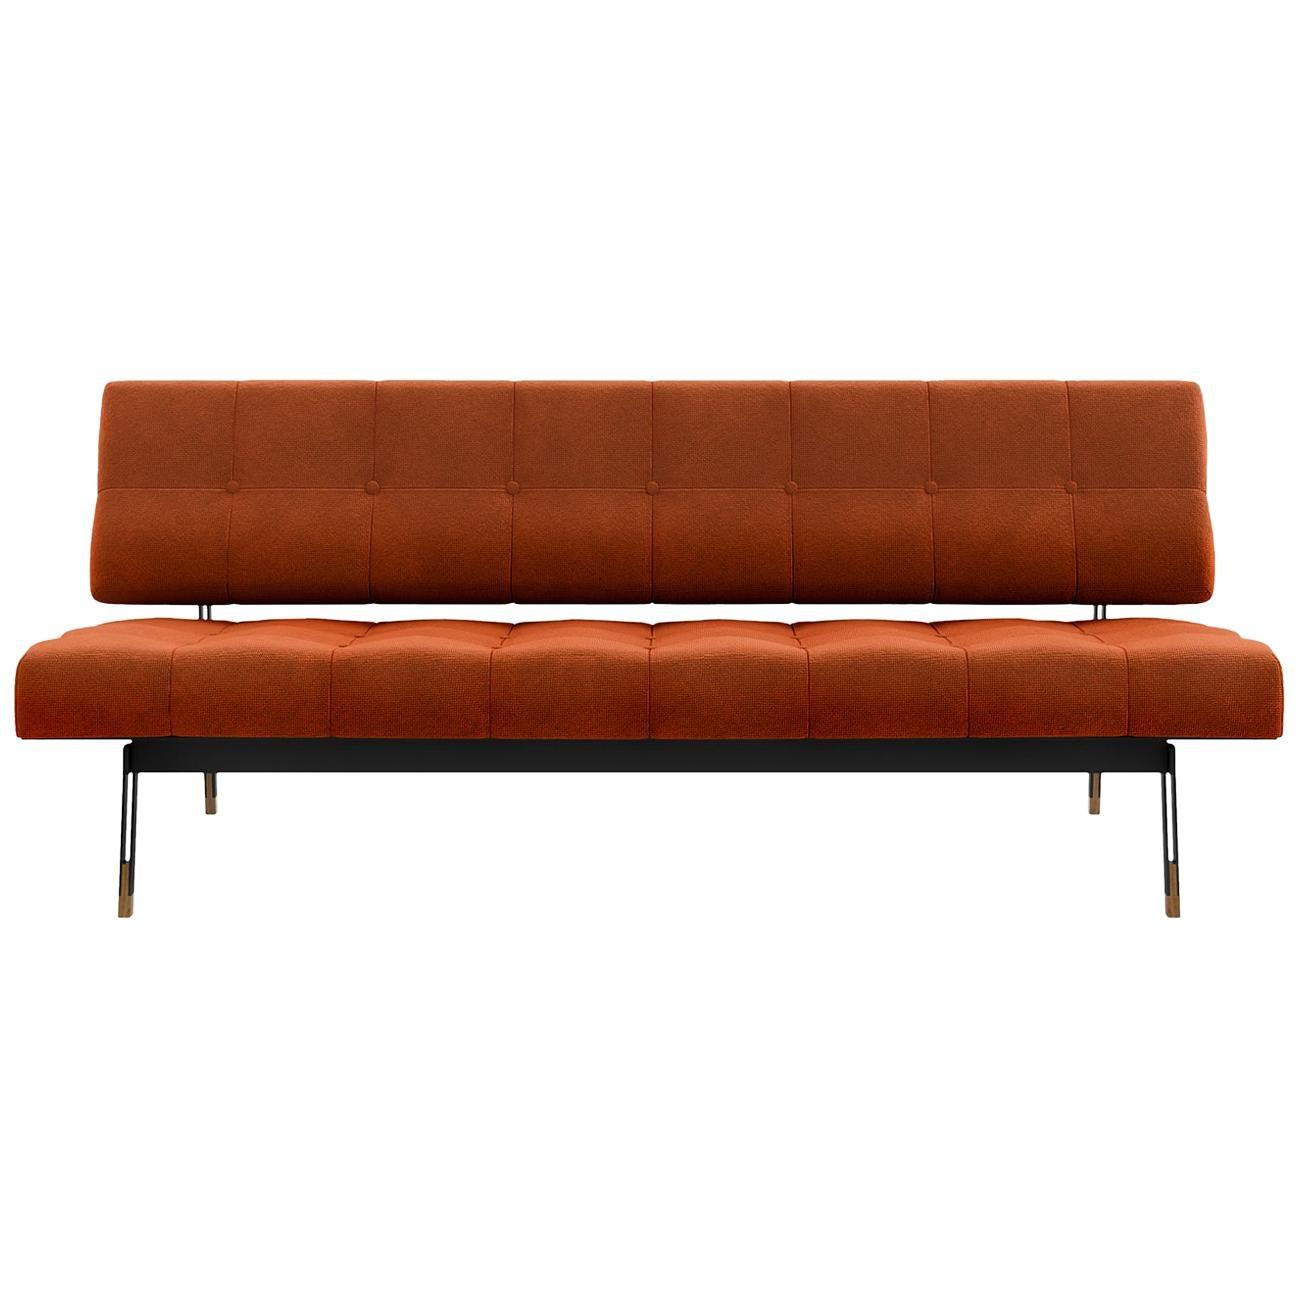 Tacchini Oliver Sofa in Orange Bryony Fabric by Gianfranco Frattini